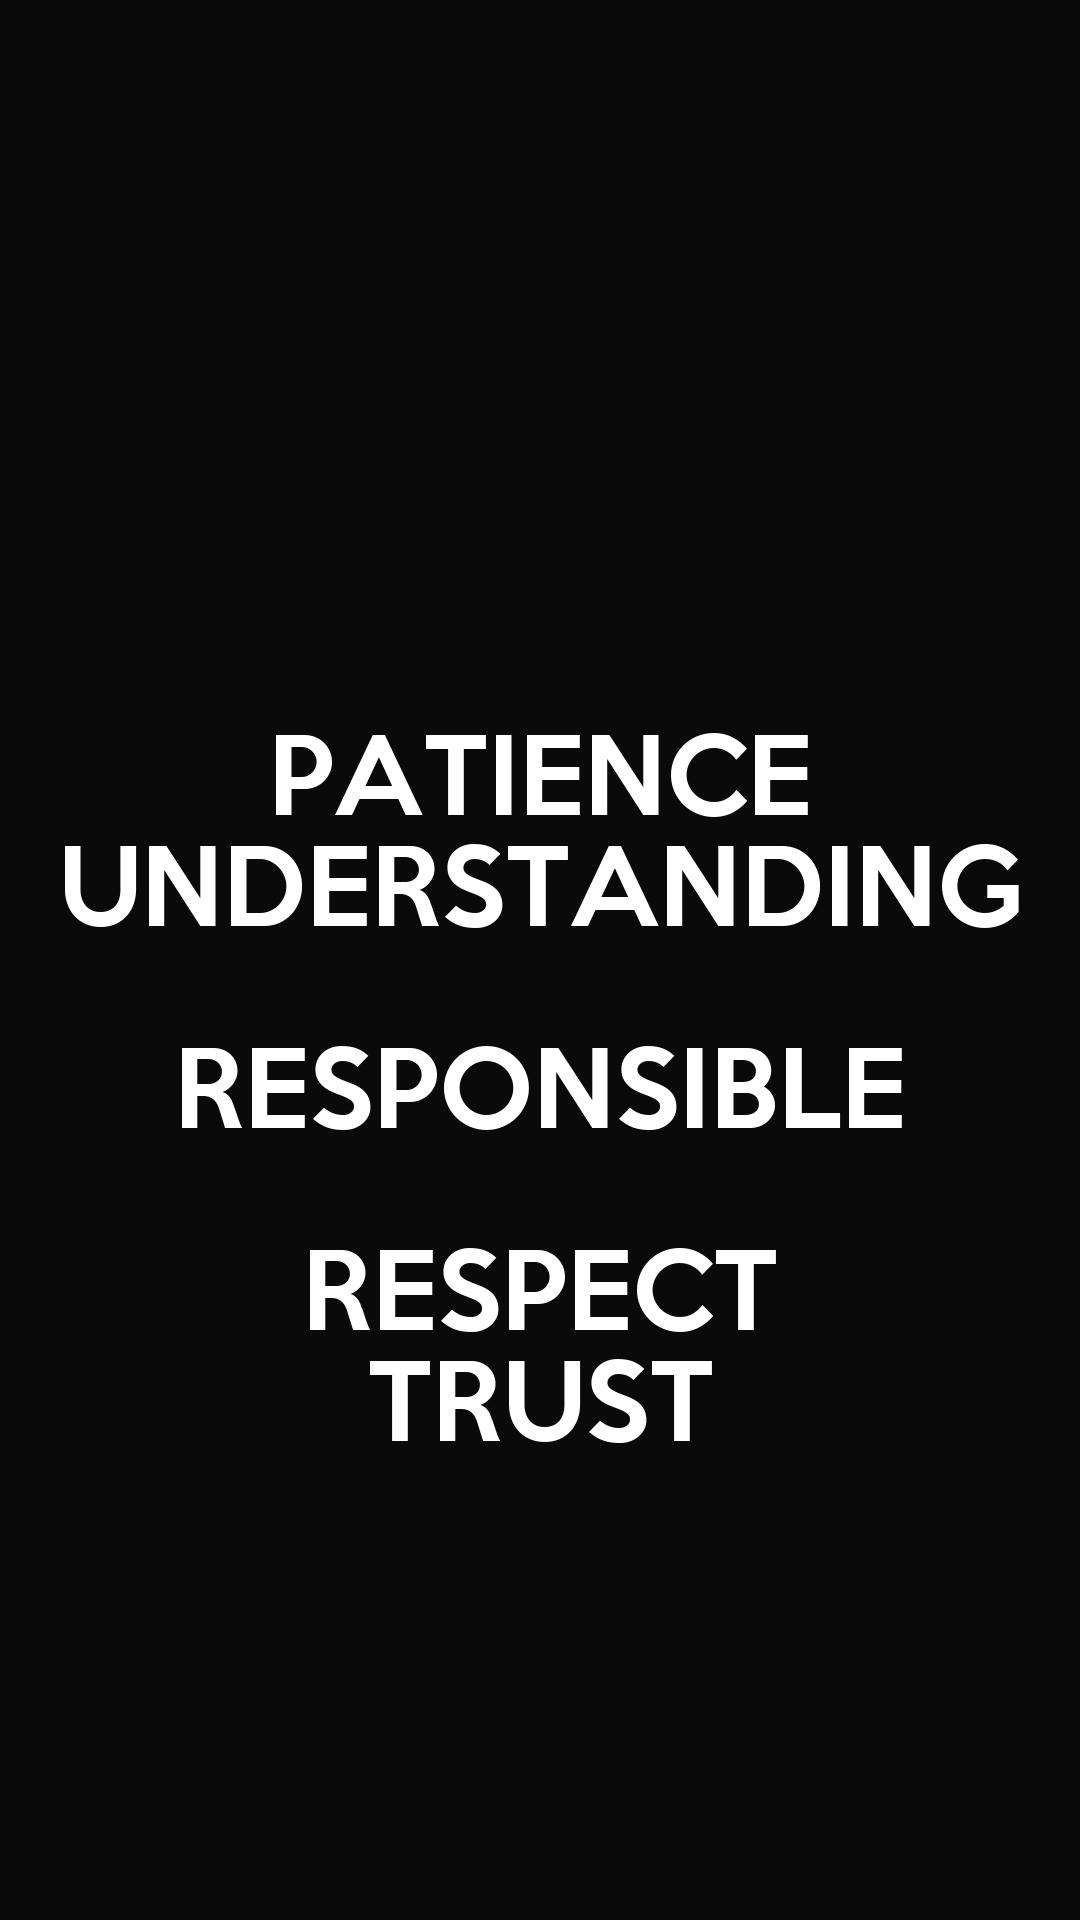 Patience-trust 11